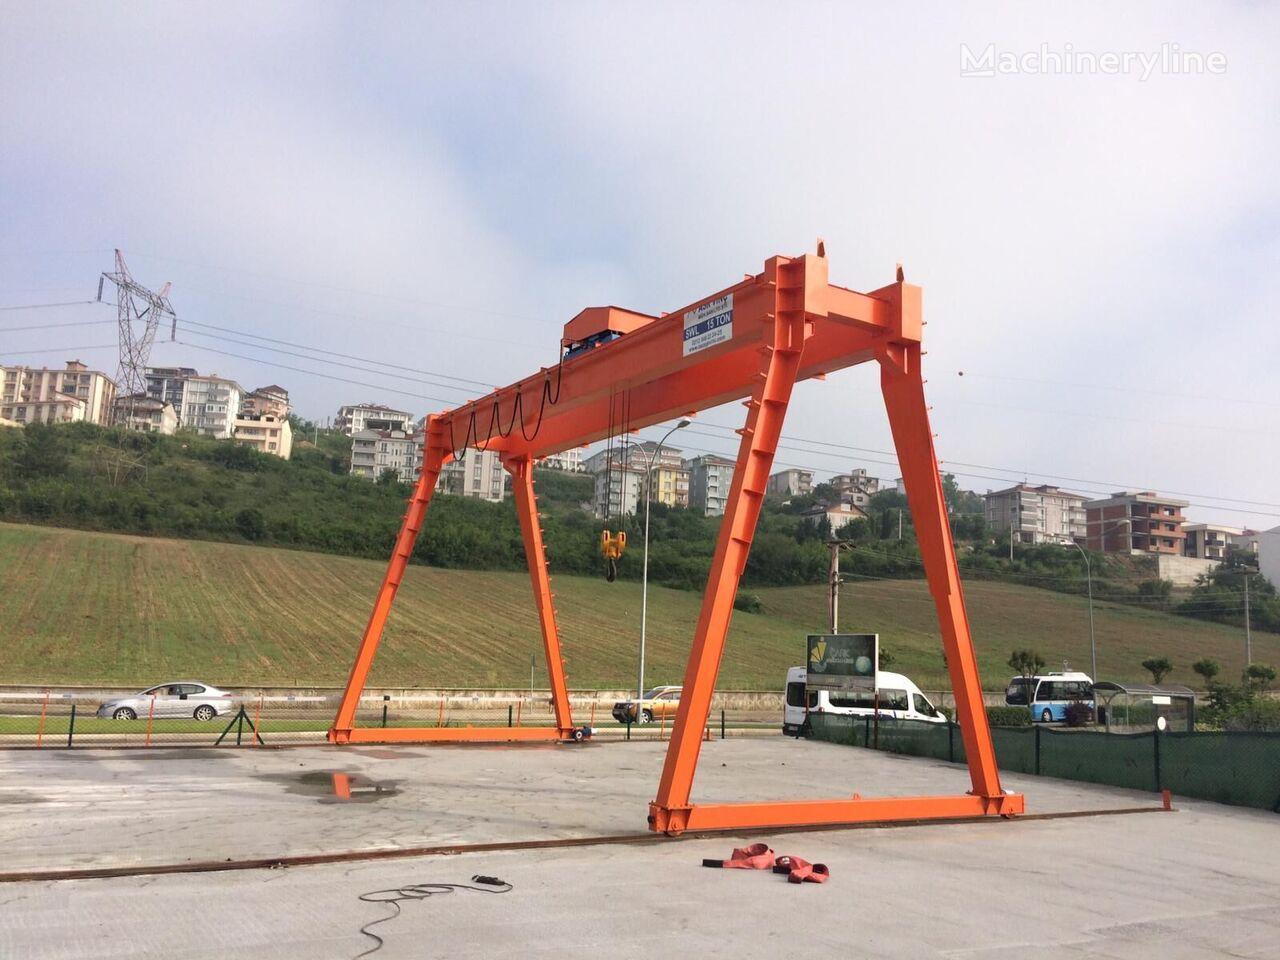 ASR VİNÇ Gantry Crane ,  Kozlovoy kran , رافعة جسرية , portal krani gantry crane